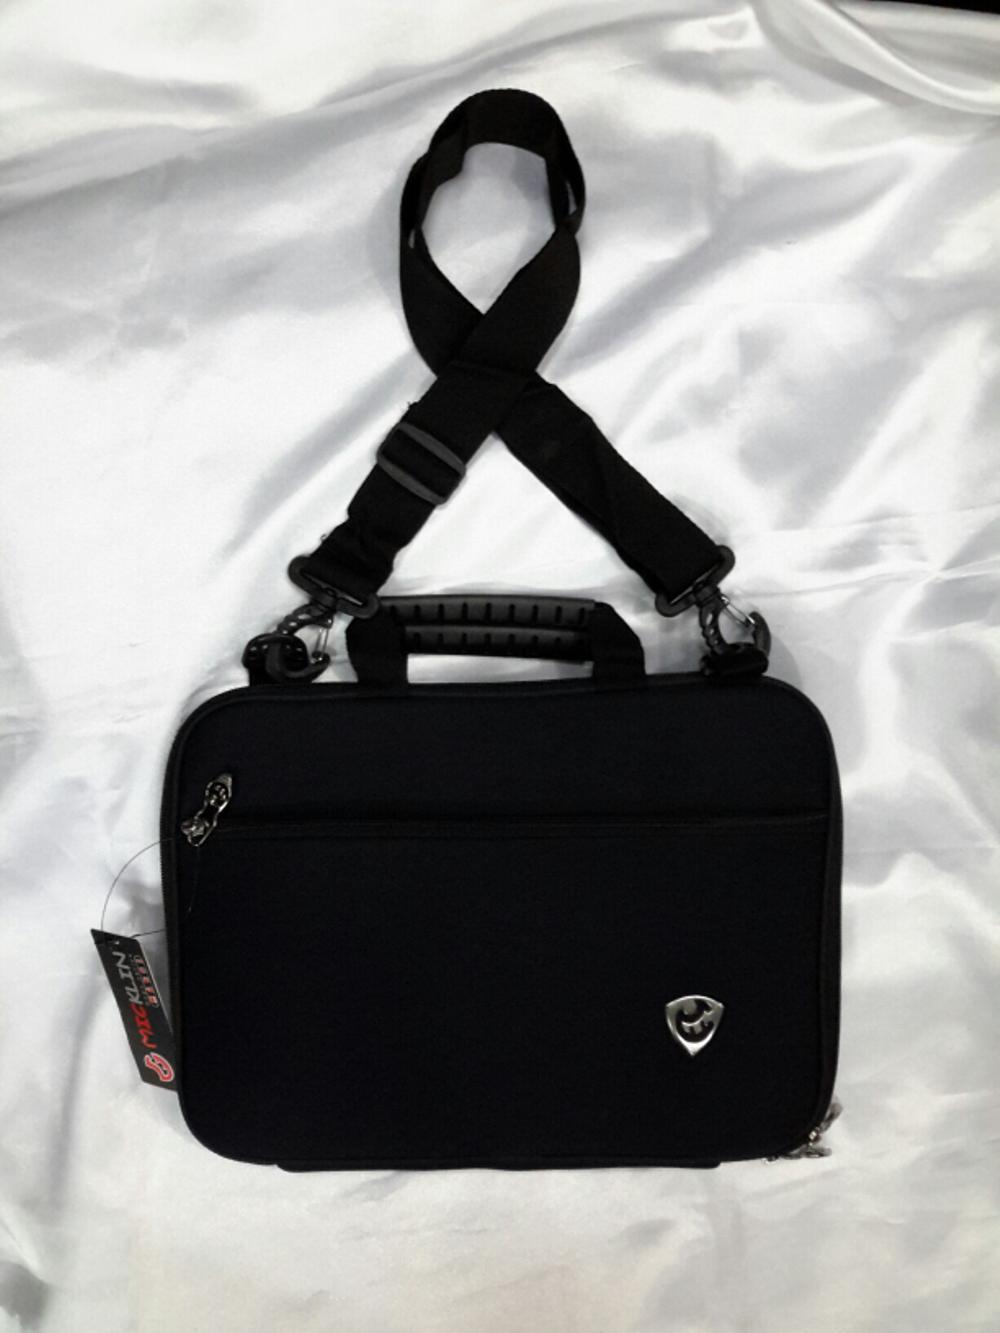 Kelebihan Tas Ransel Laptop Micklin 3 In 1 A02 16 Inchi Black Sekolah 3in1 Softcase 12 811